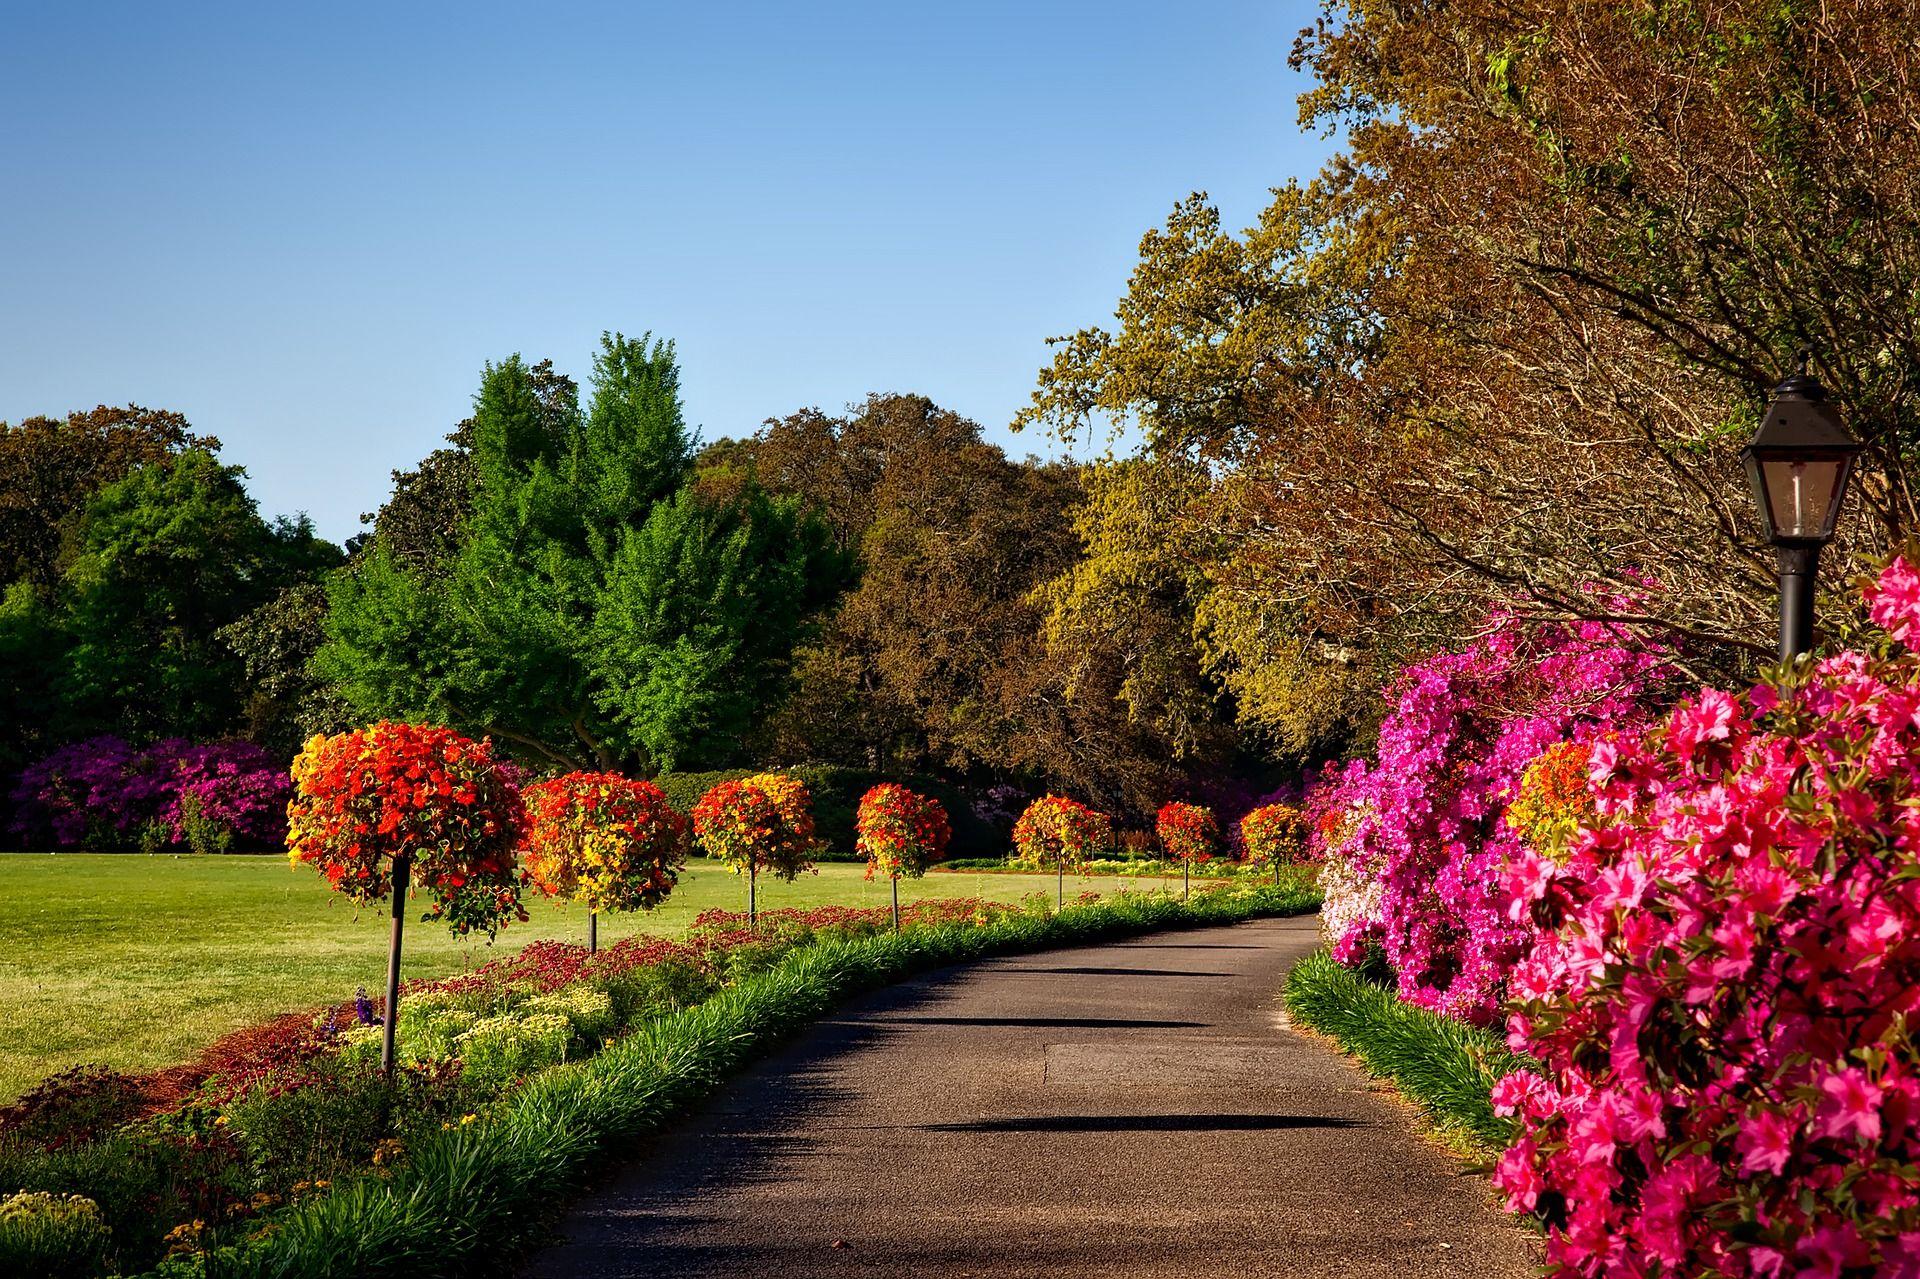 Weight Loss Diets Pinterest Gardening Services Flowering Shrubs